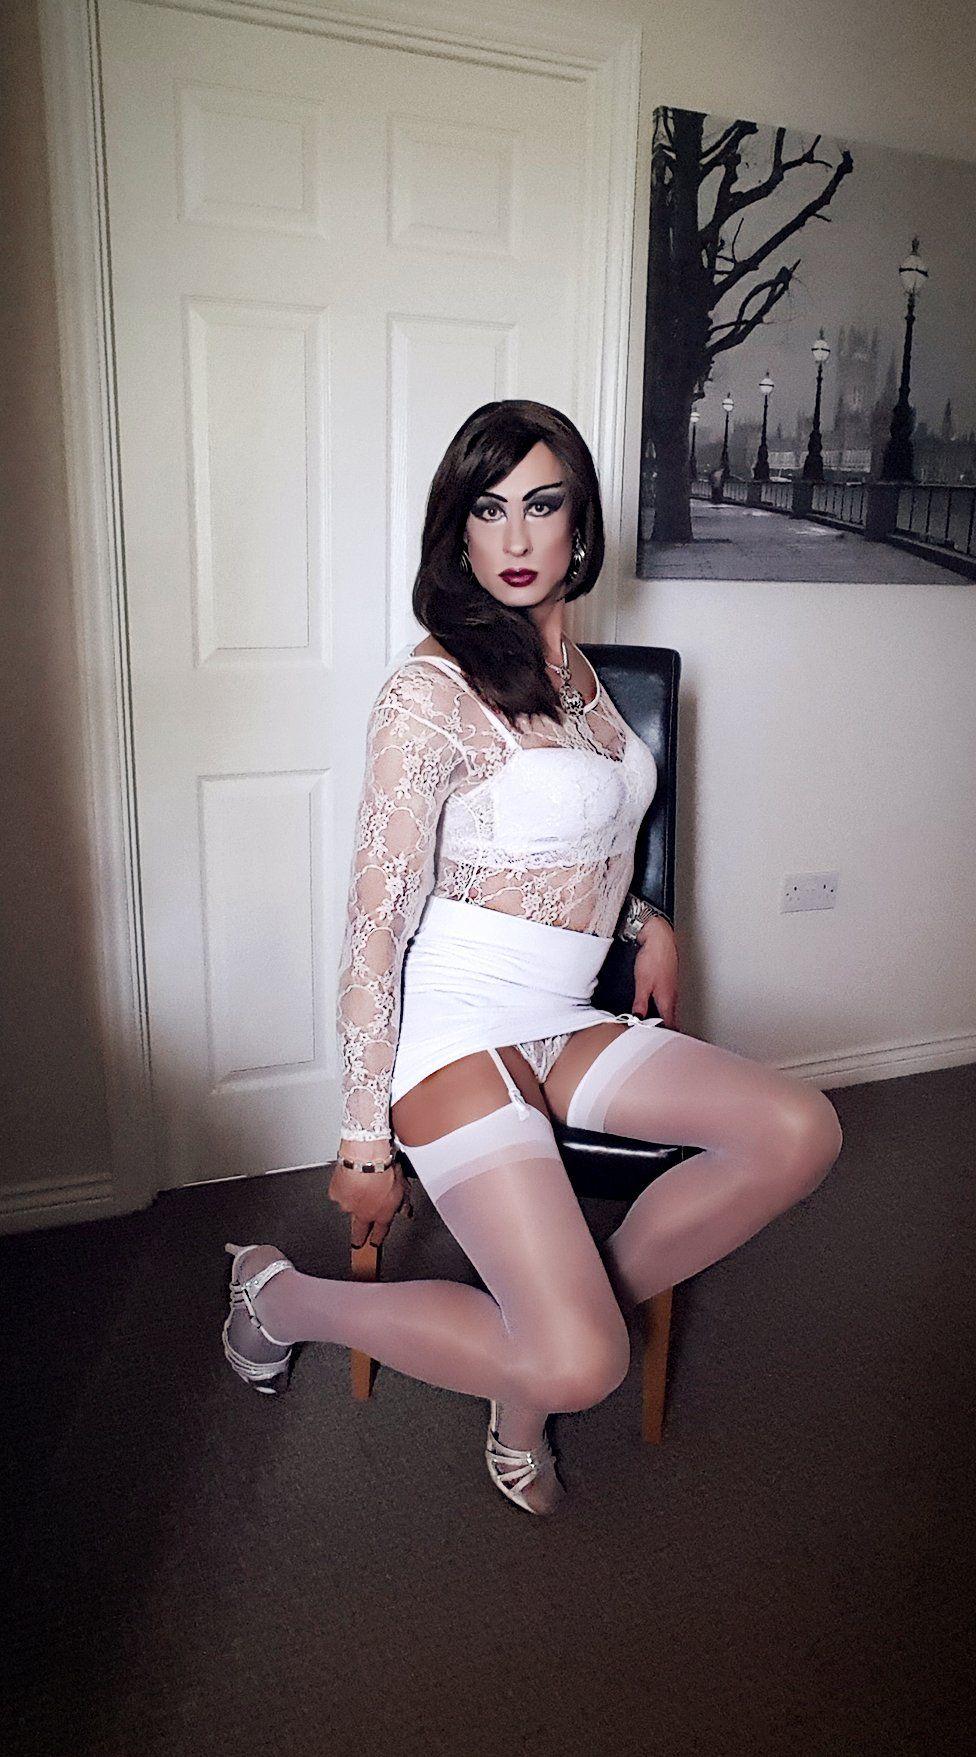 Transvestite escort bristol